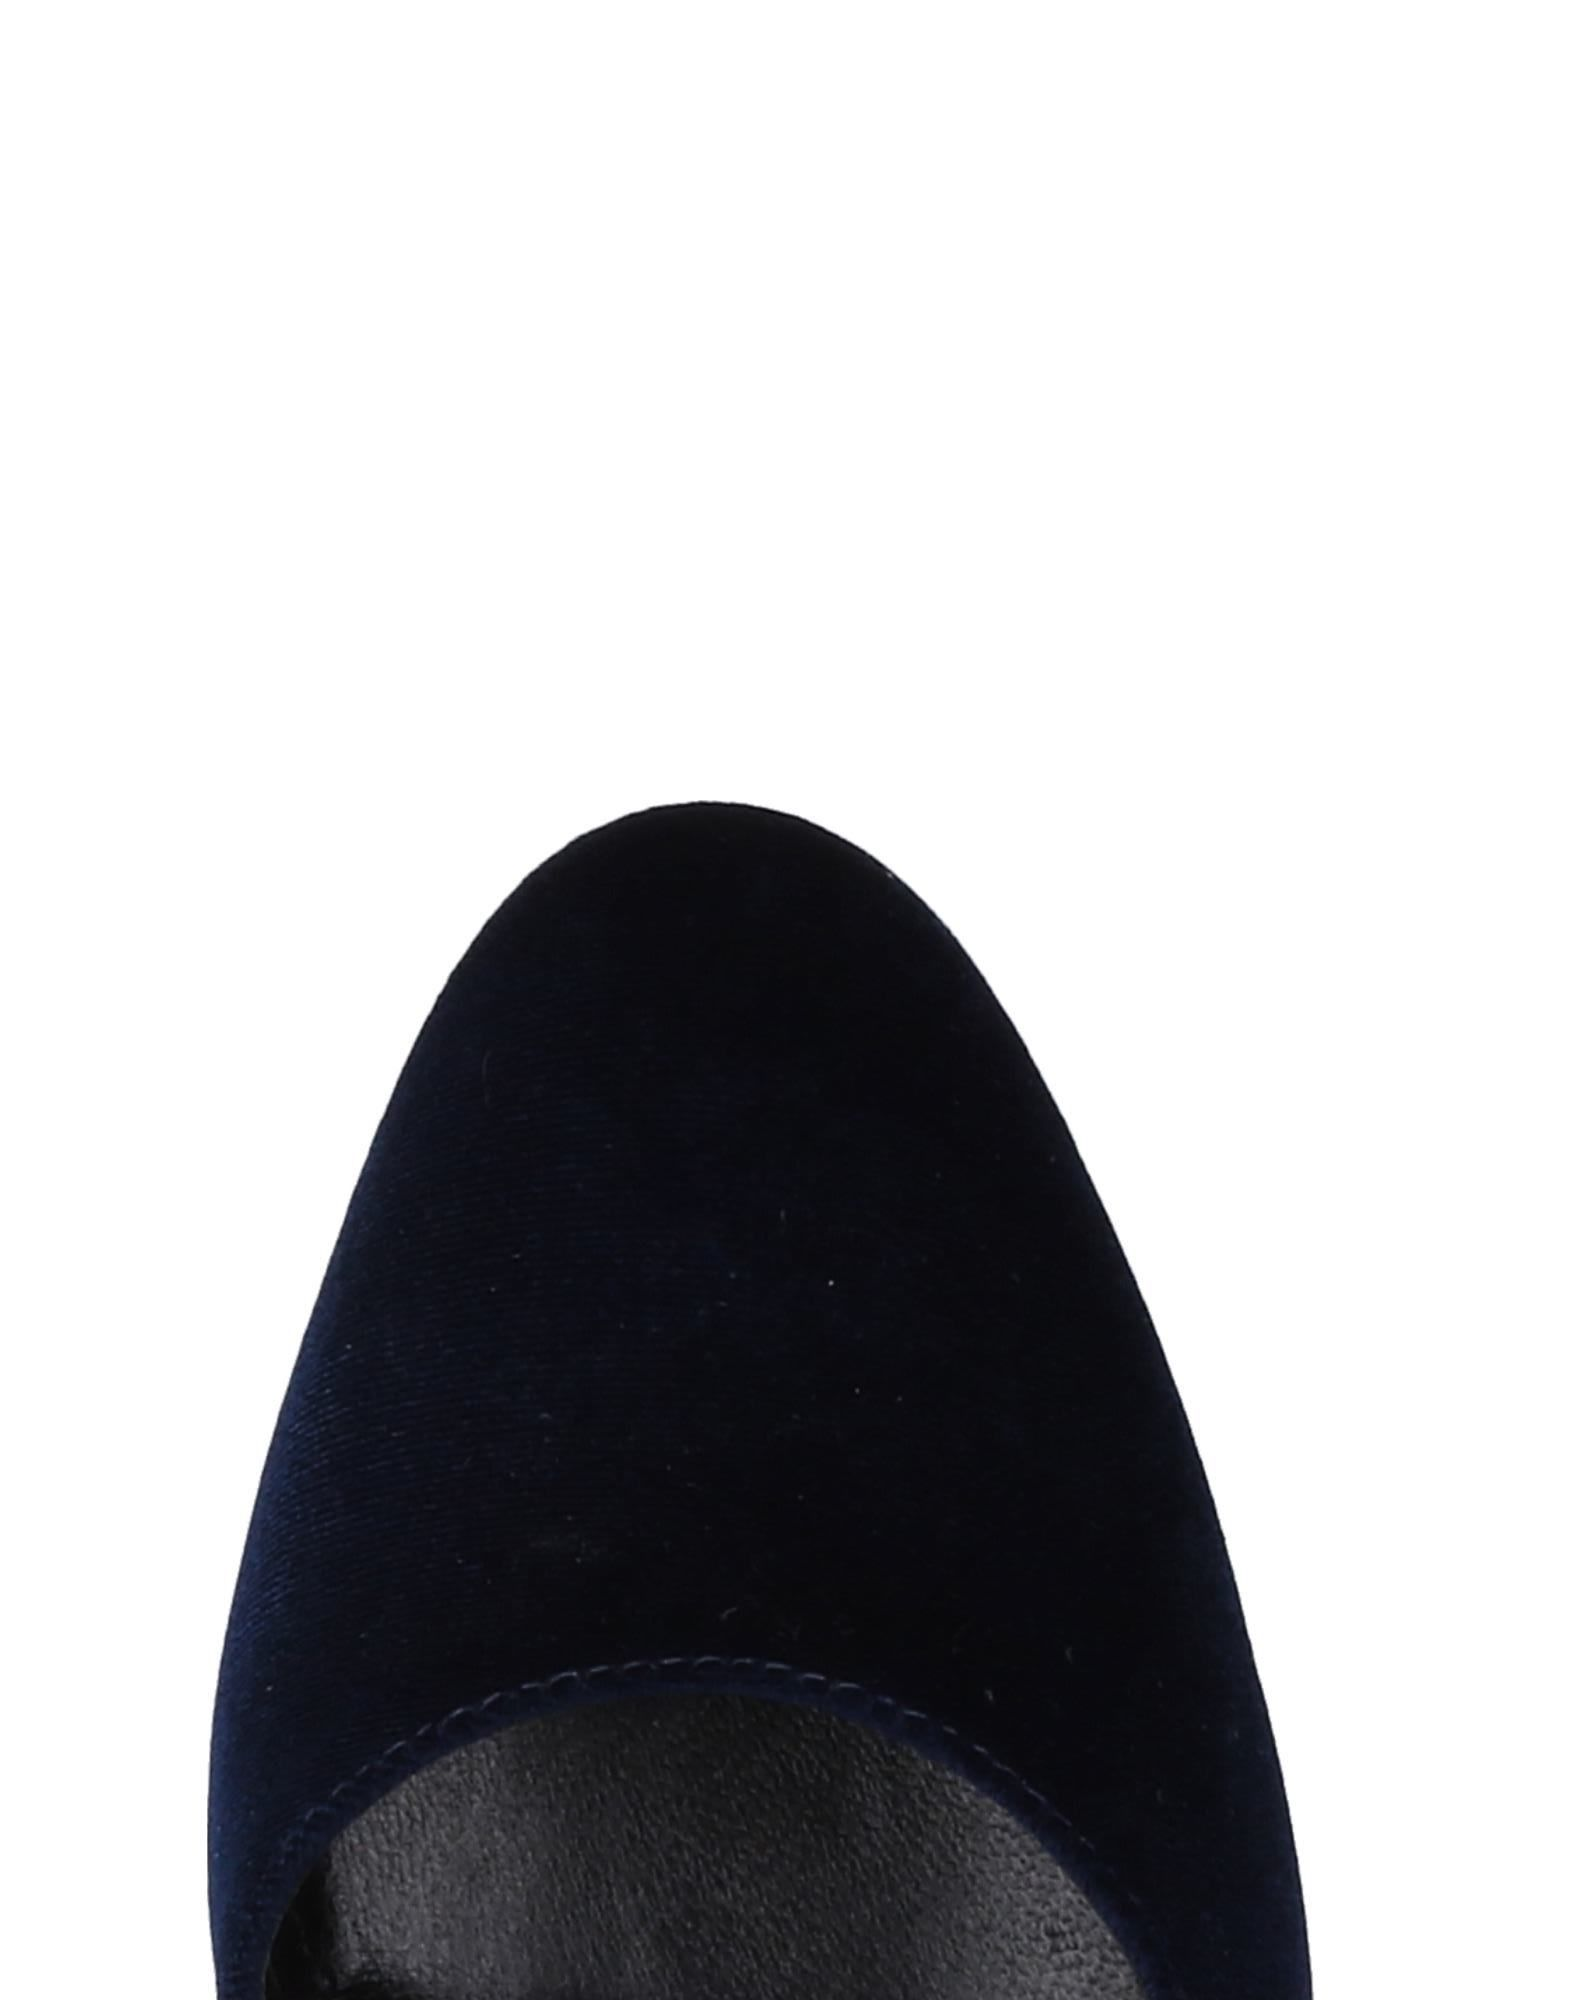 Tipe E Tacchi Pumps beliebte Damen  11516744GB Gute Qualität beliebte Pumps Schuhe bd48fb